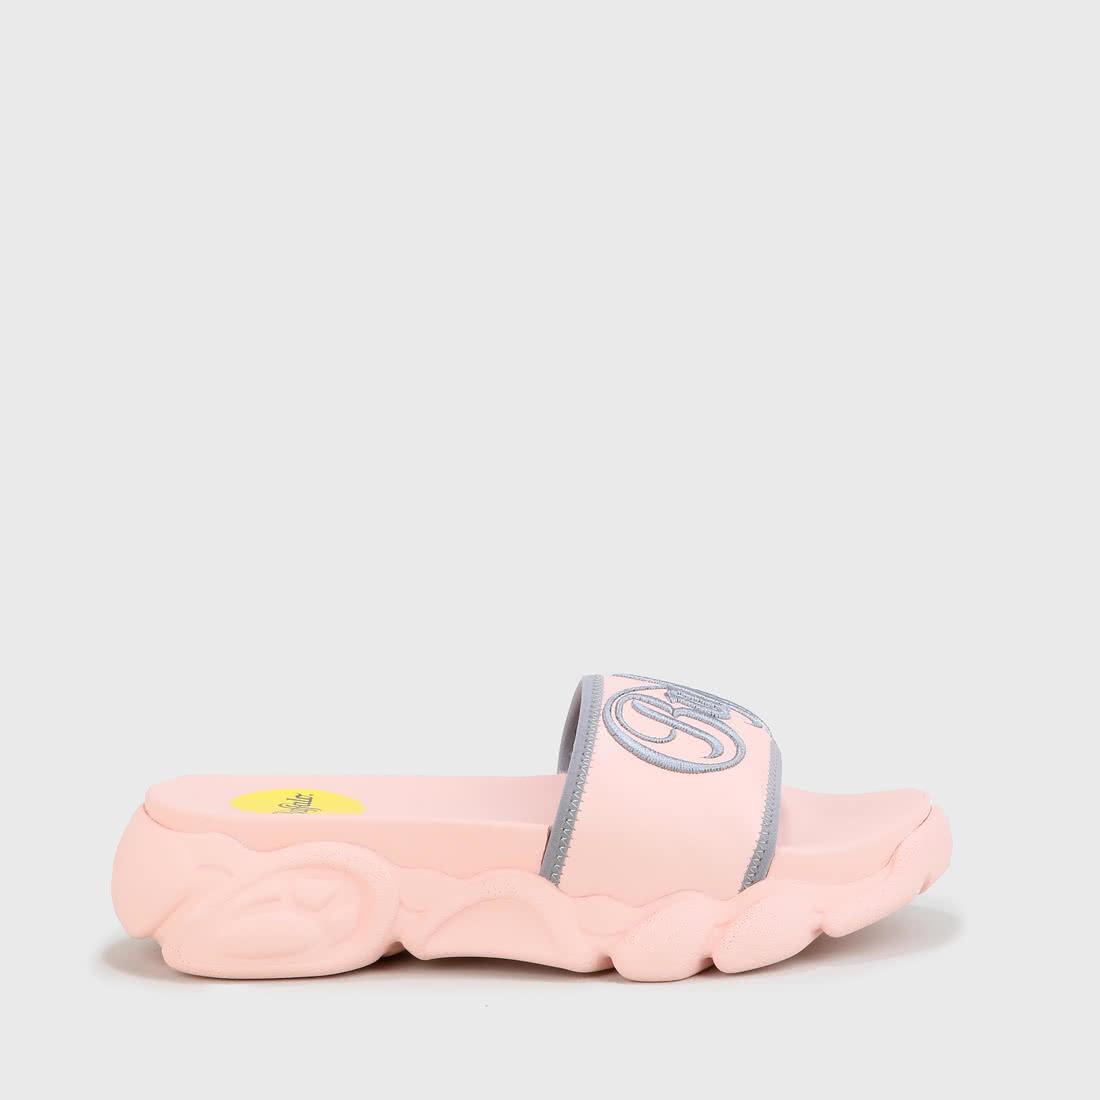 034cca5ed Elani sandals neoprene pink grey buy online in BUFFALO Online-Shop ...